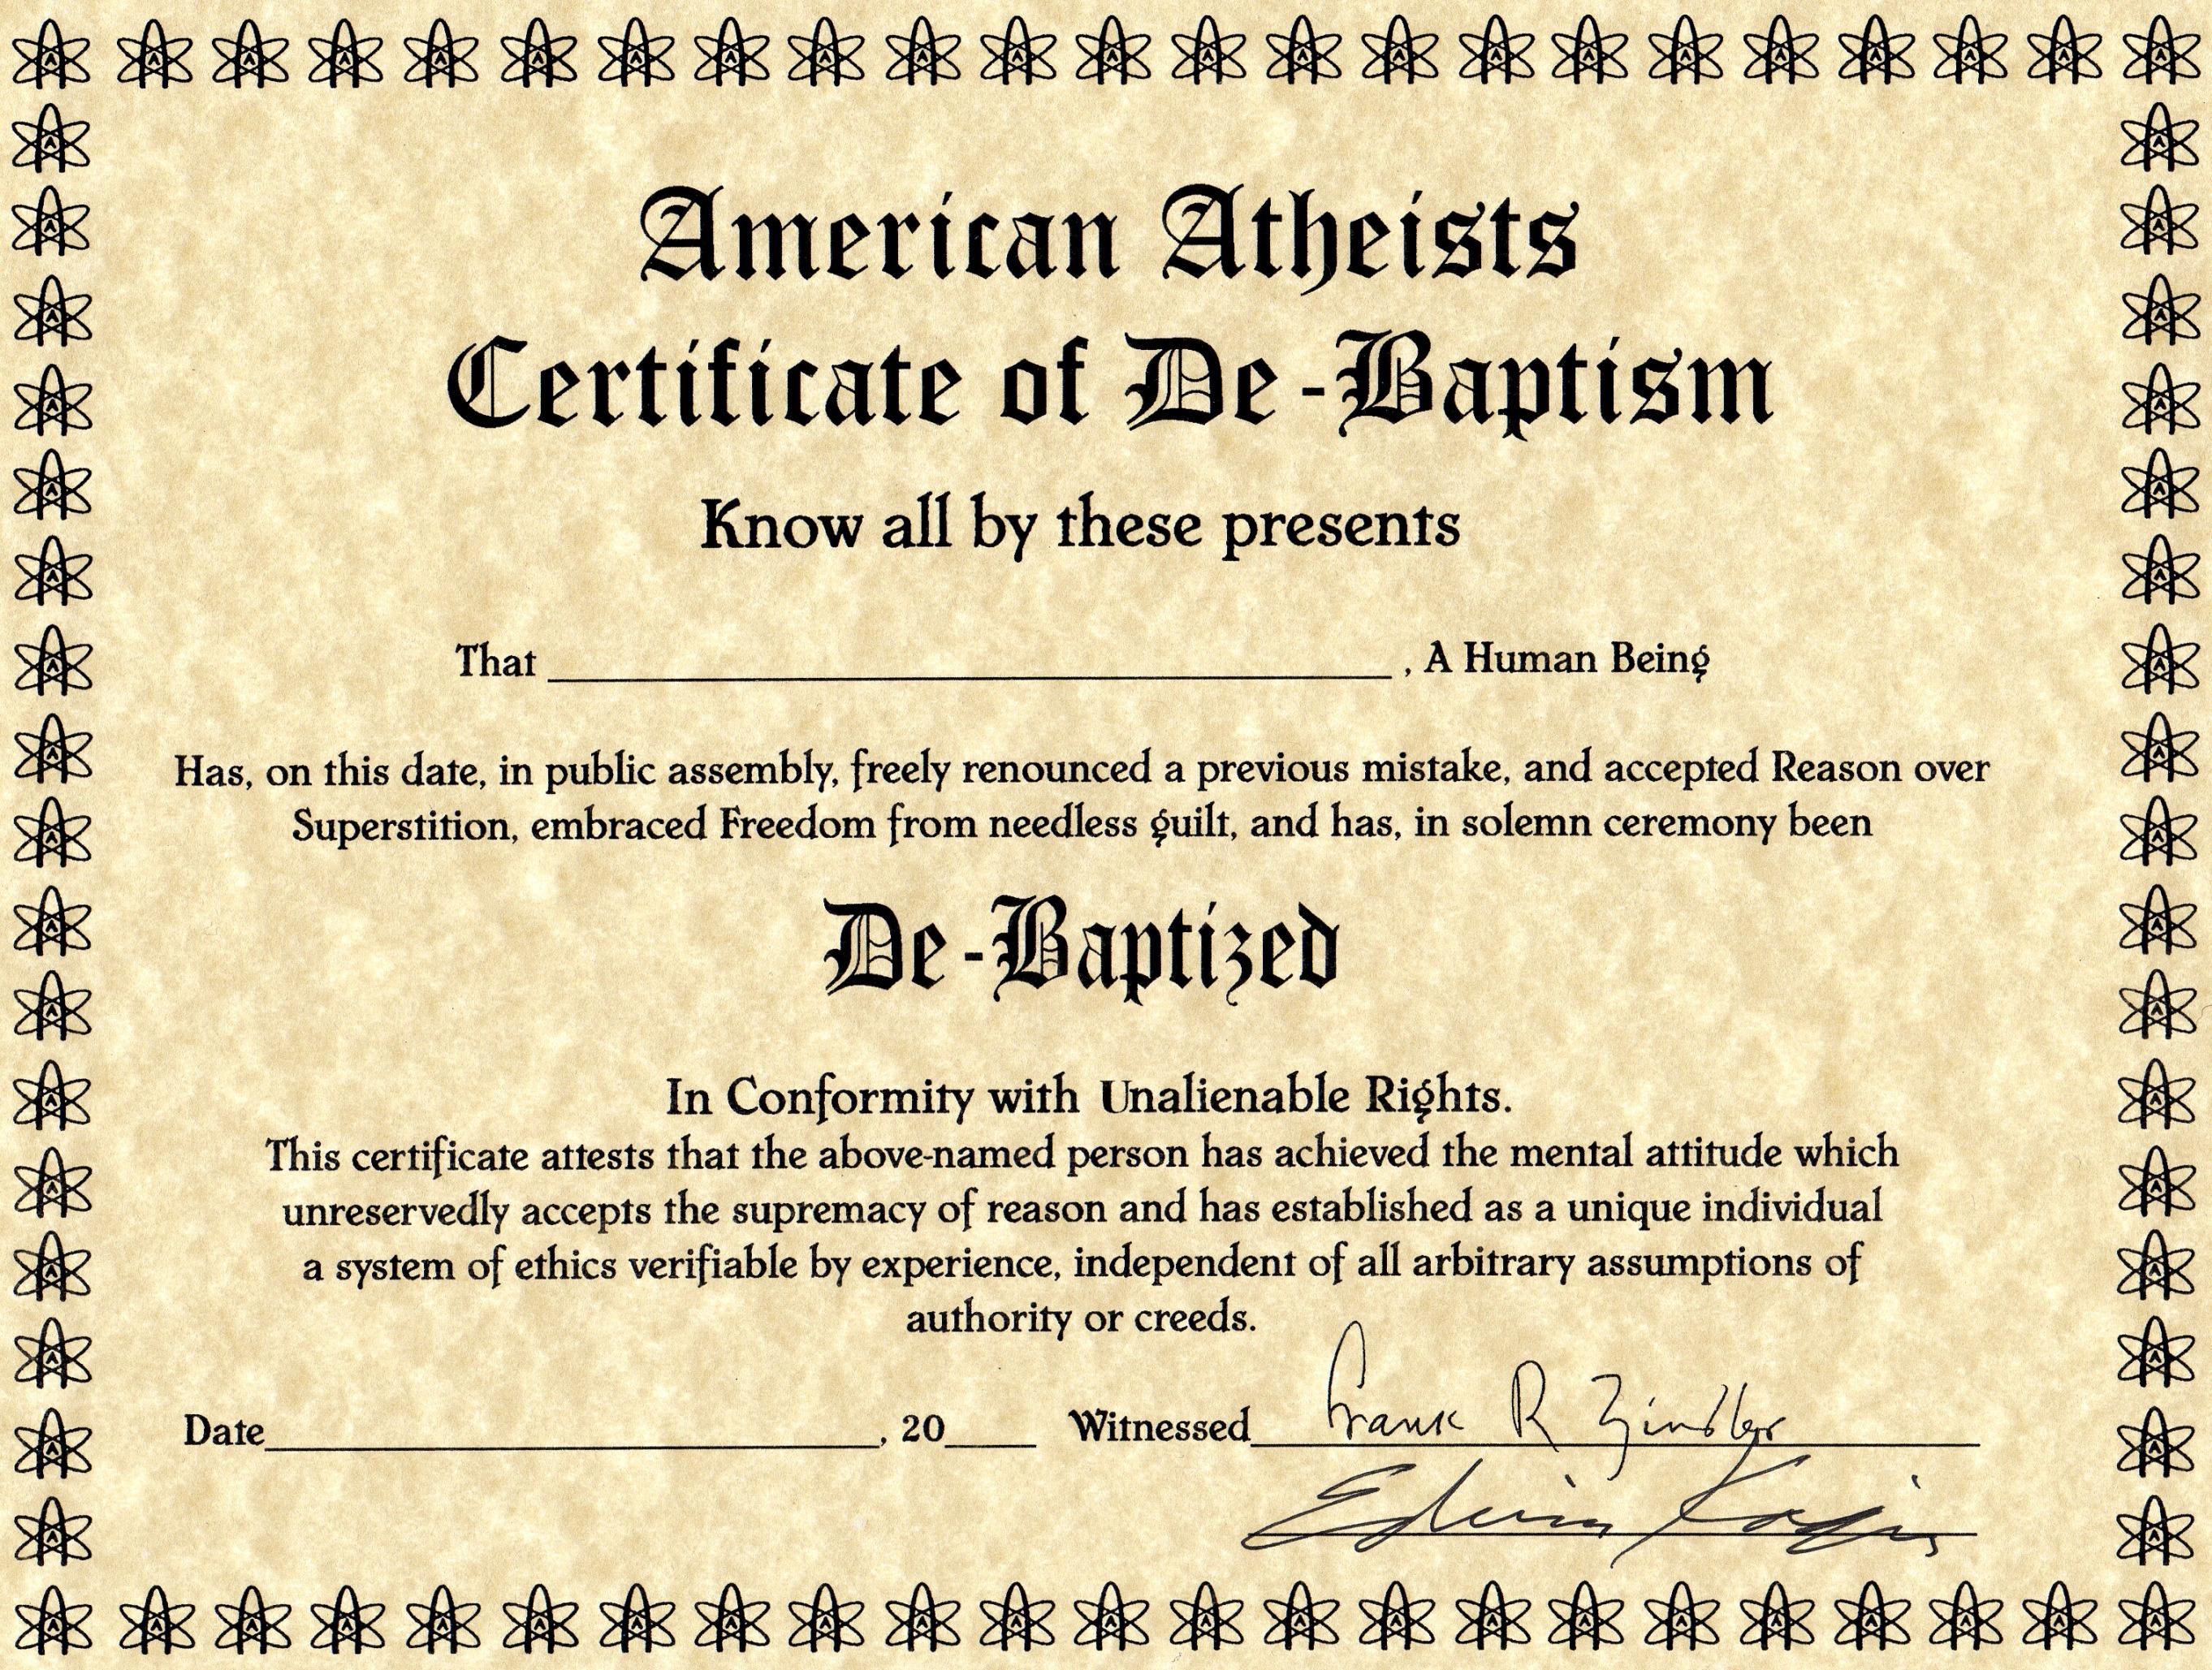 american atheists certificate of de baptism picture ebaum s world